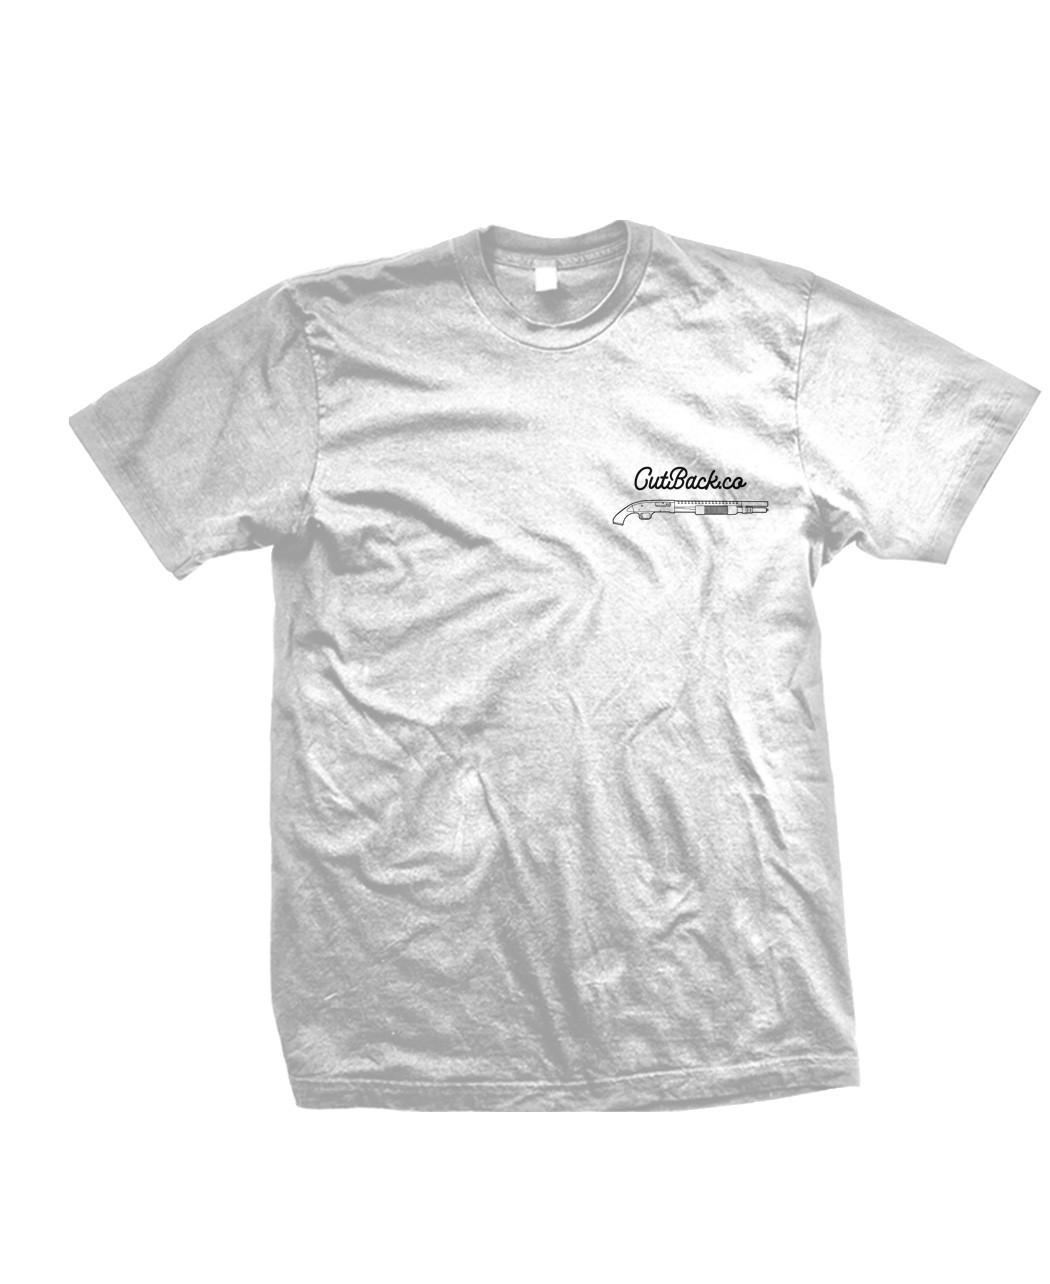 """Peace Through Superior Fire Power"" T-Shirt Design"